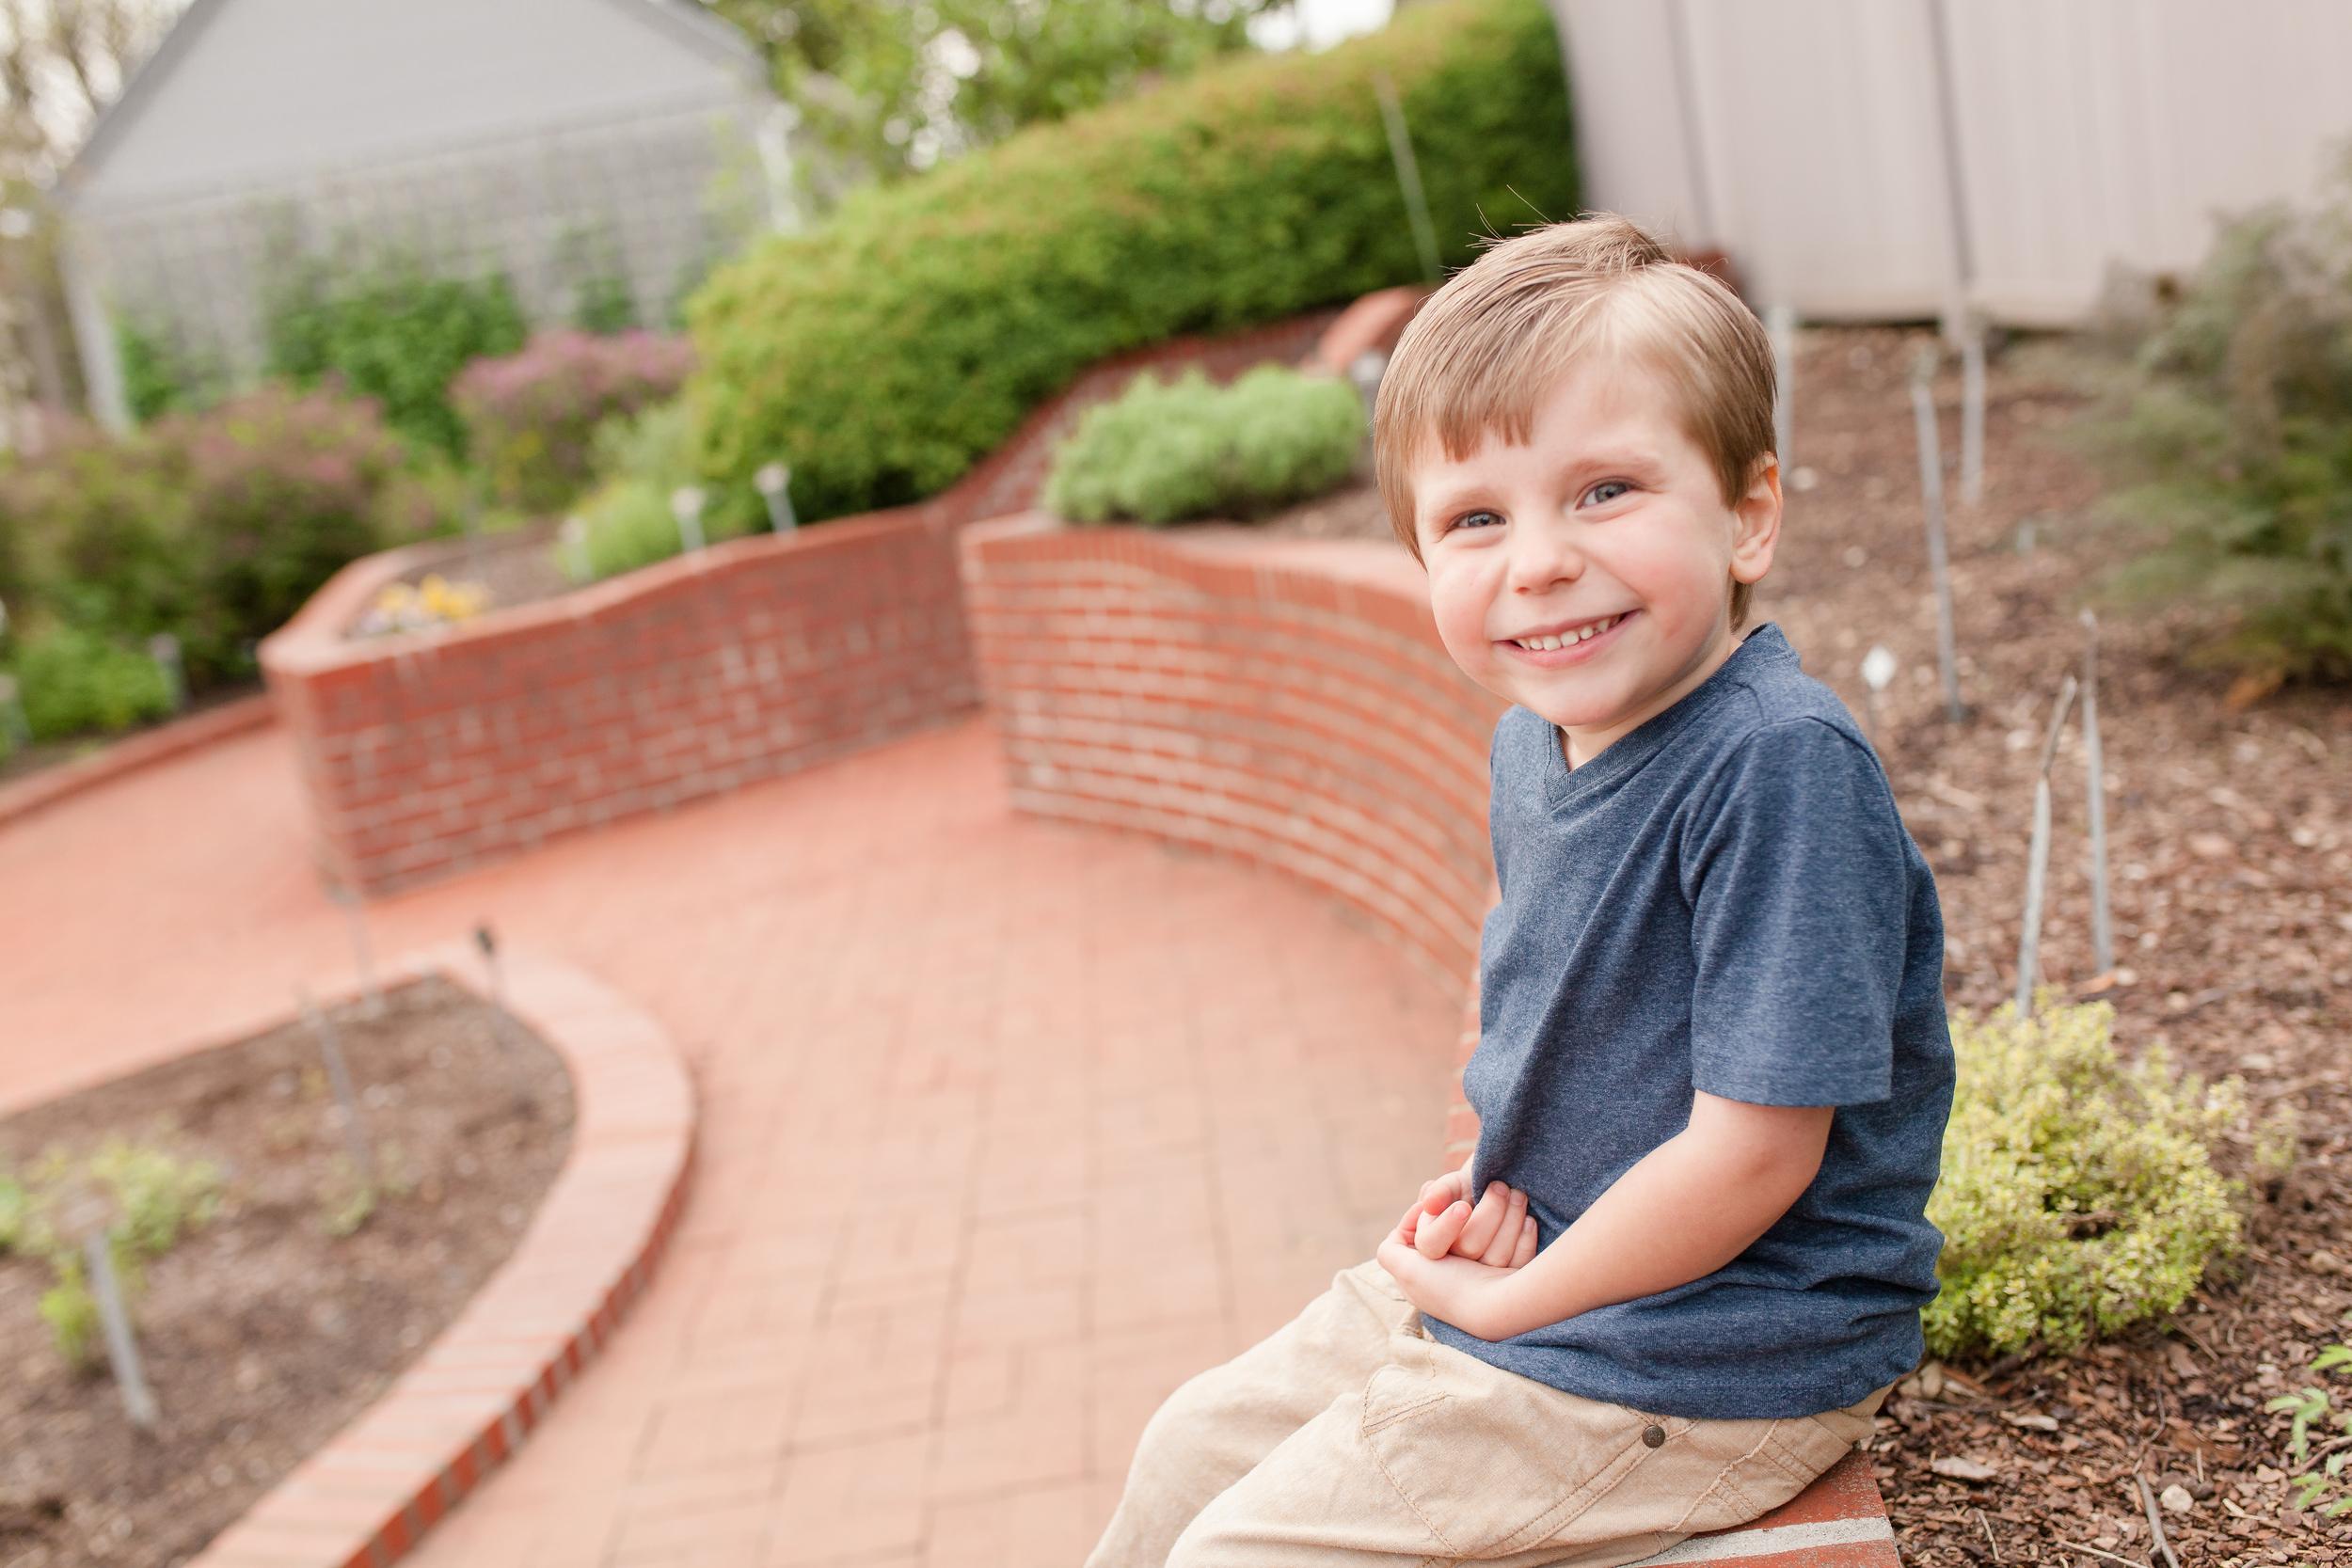 Columbus Maternity Photography | Columbus Ohio Photographer | Sarah Cropper Photography | Grove City Ohio Photographer